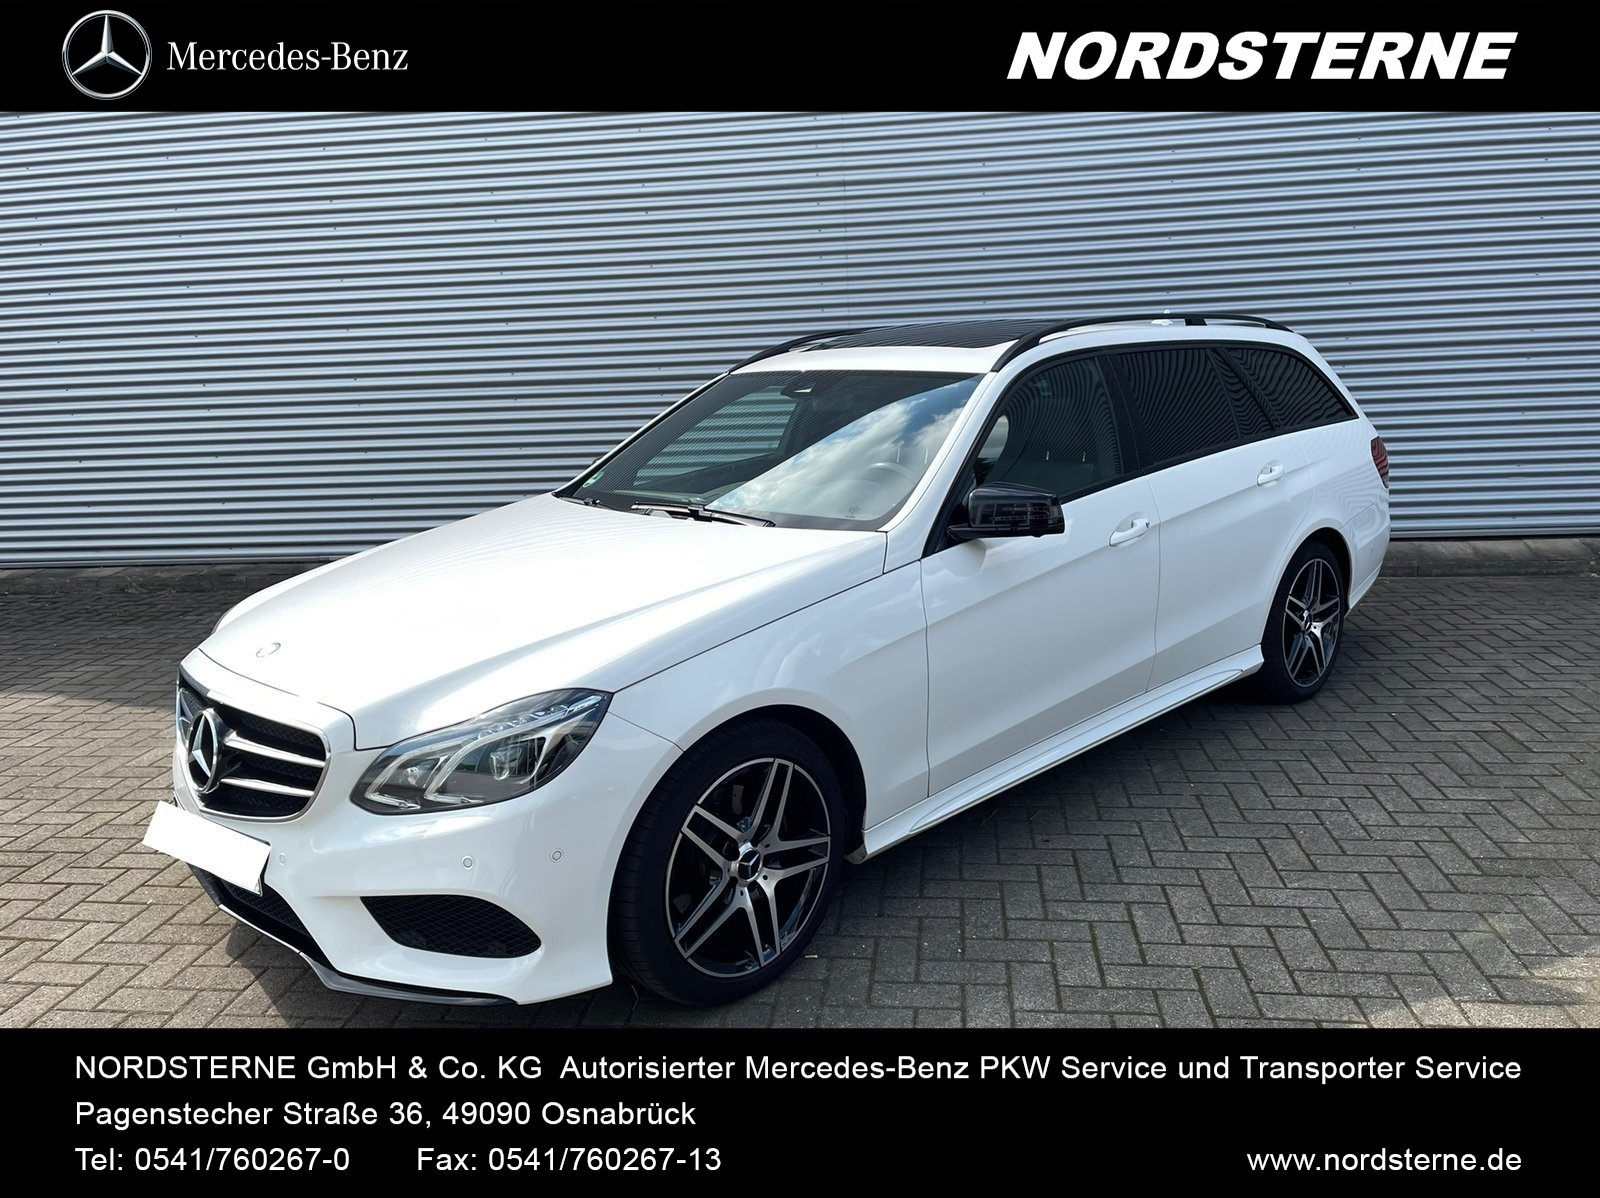 Mercedes-Benz E 250 BT T AMG+Night+ILS+AHK+SHD+360°+EASY PACK, Jahr 2016, Diesel